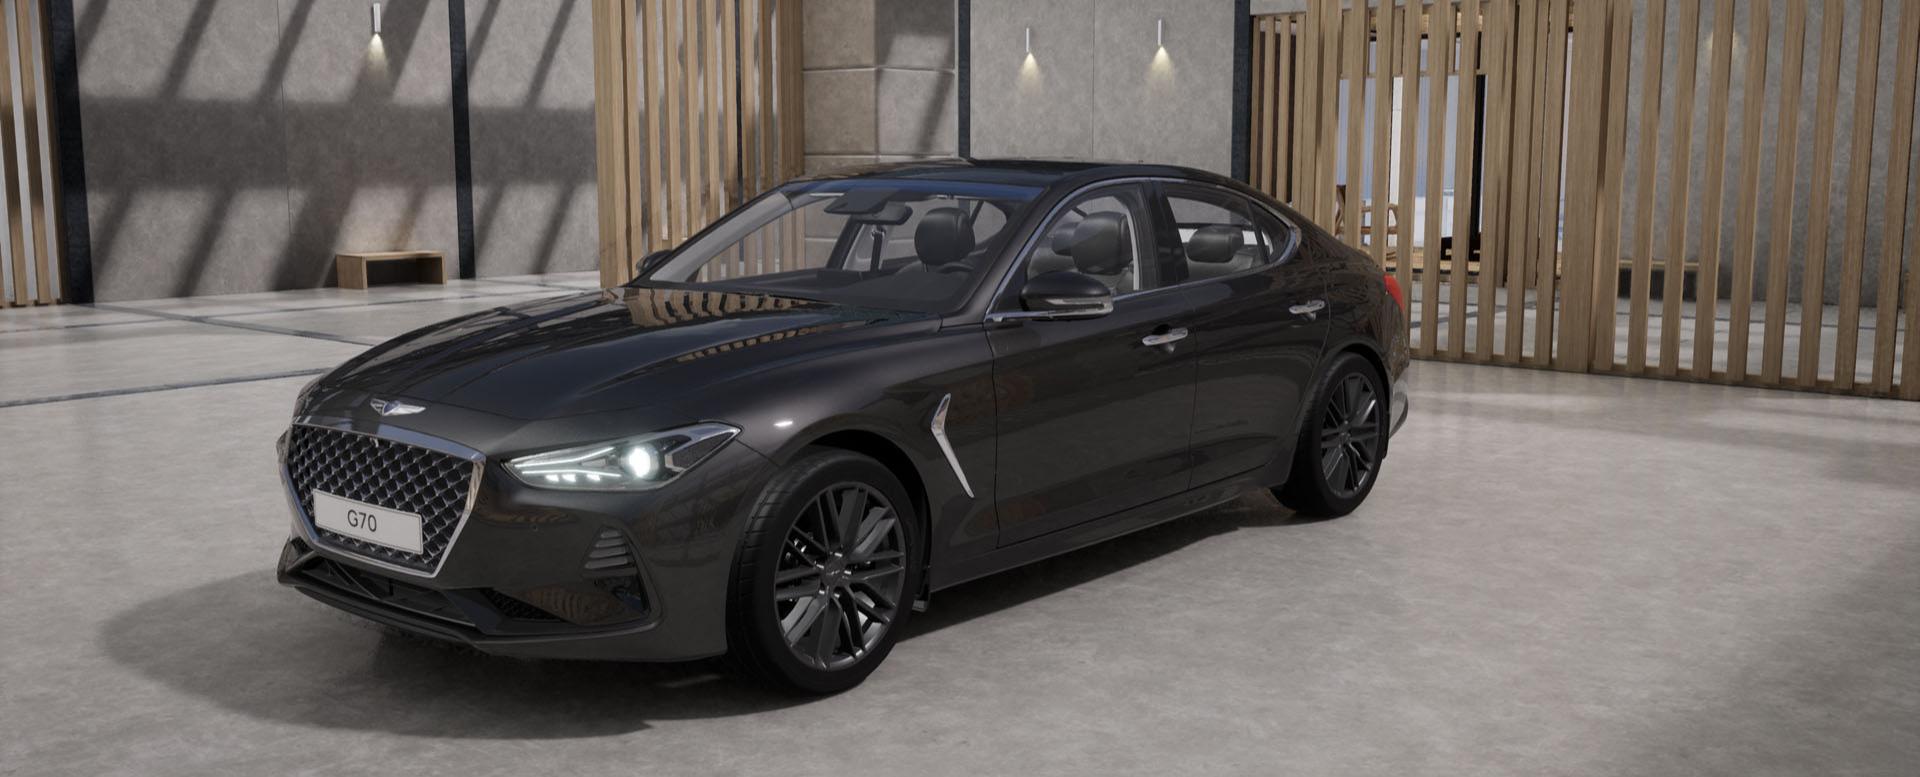 Genesis G70 Седан (Elegance)